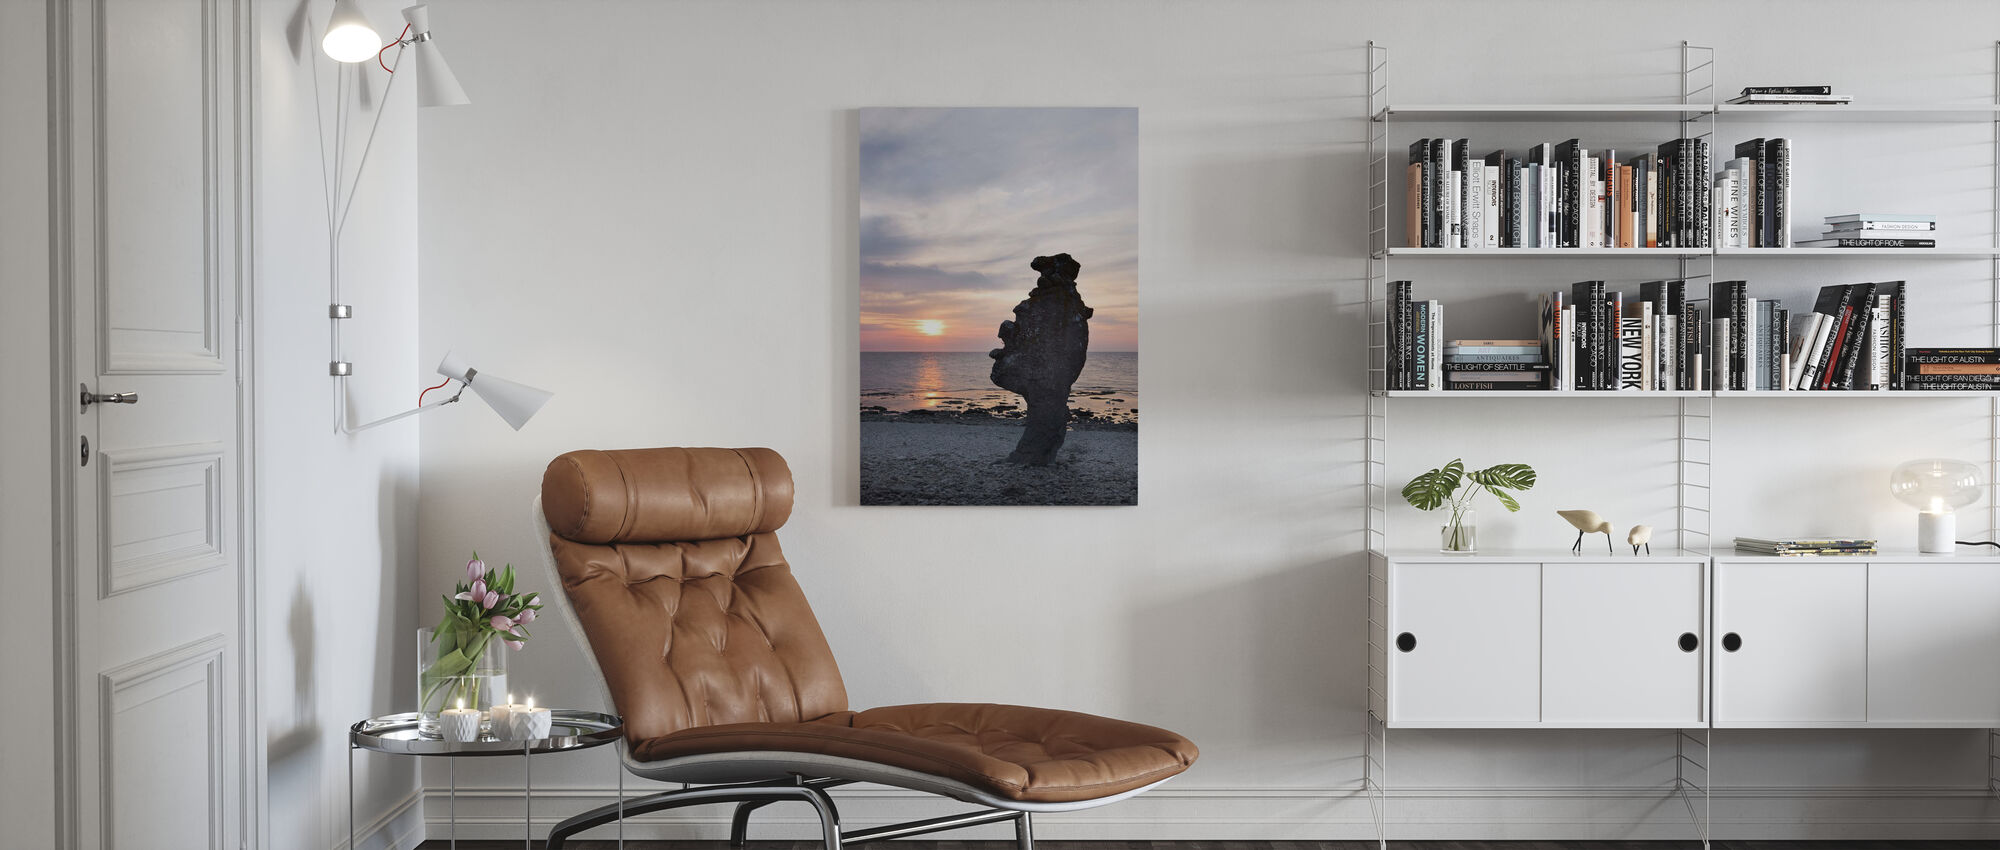 Gotland Rauk - Canvas print - Living Room